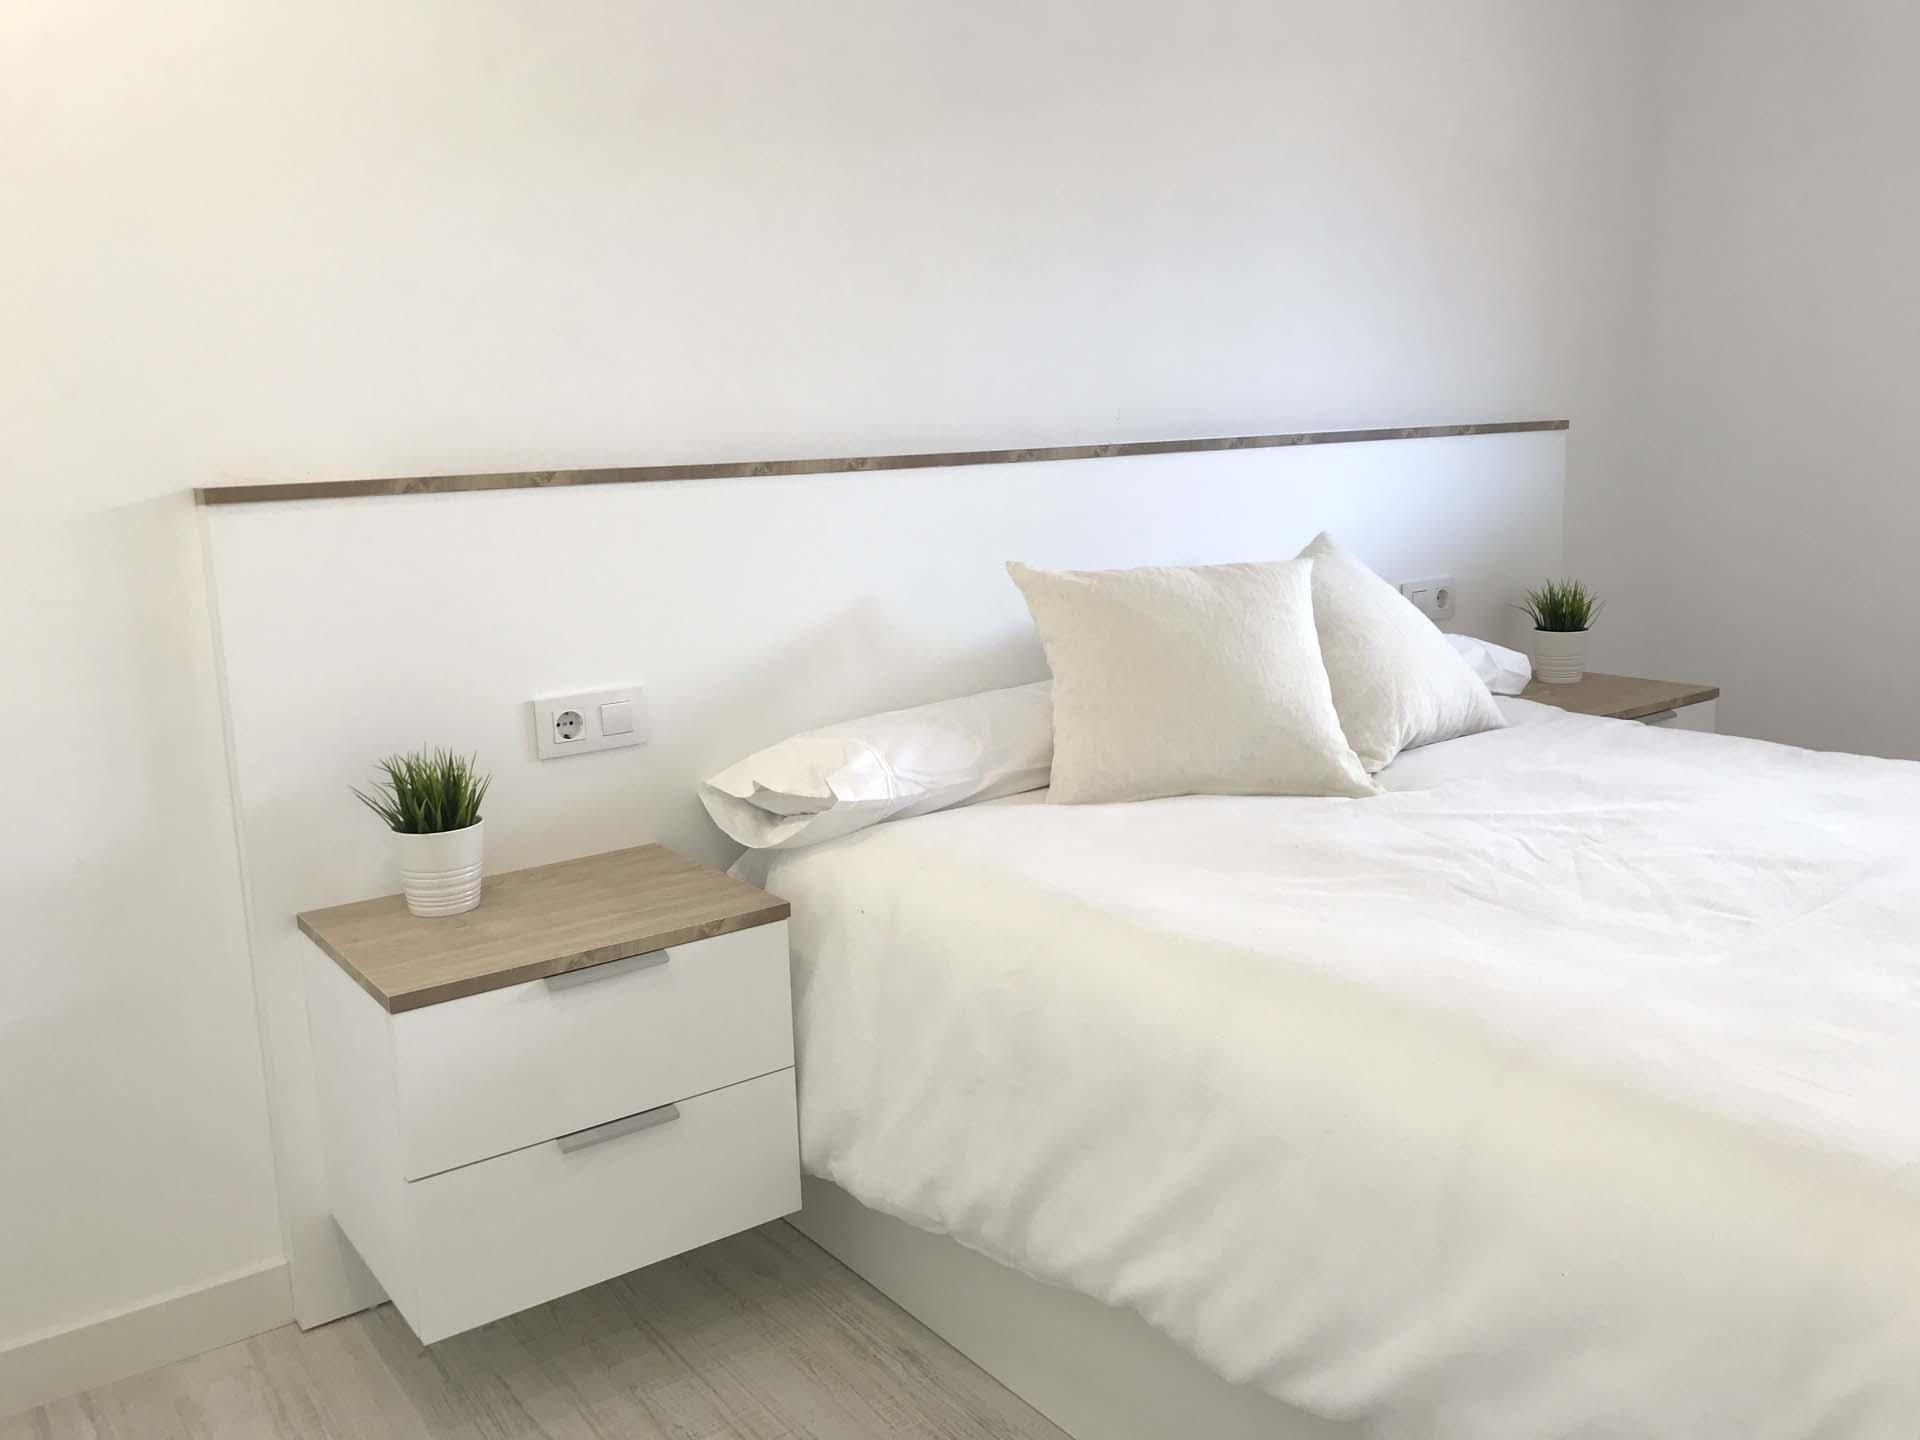 dormitorio cabecero mesilla mueble